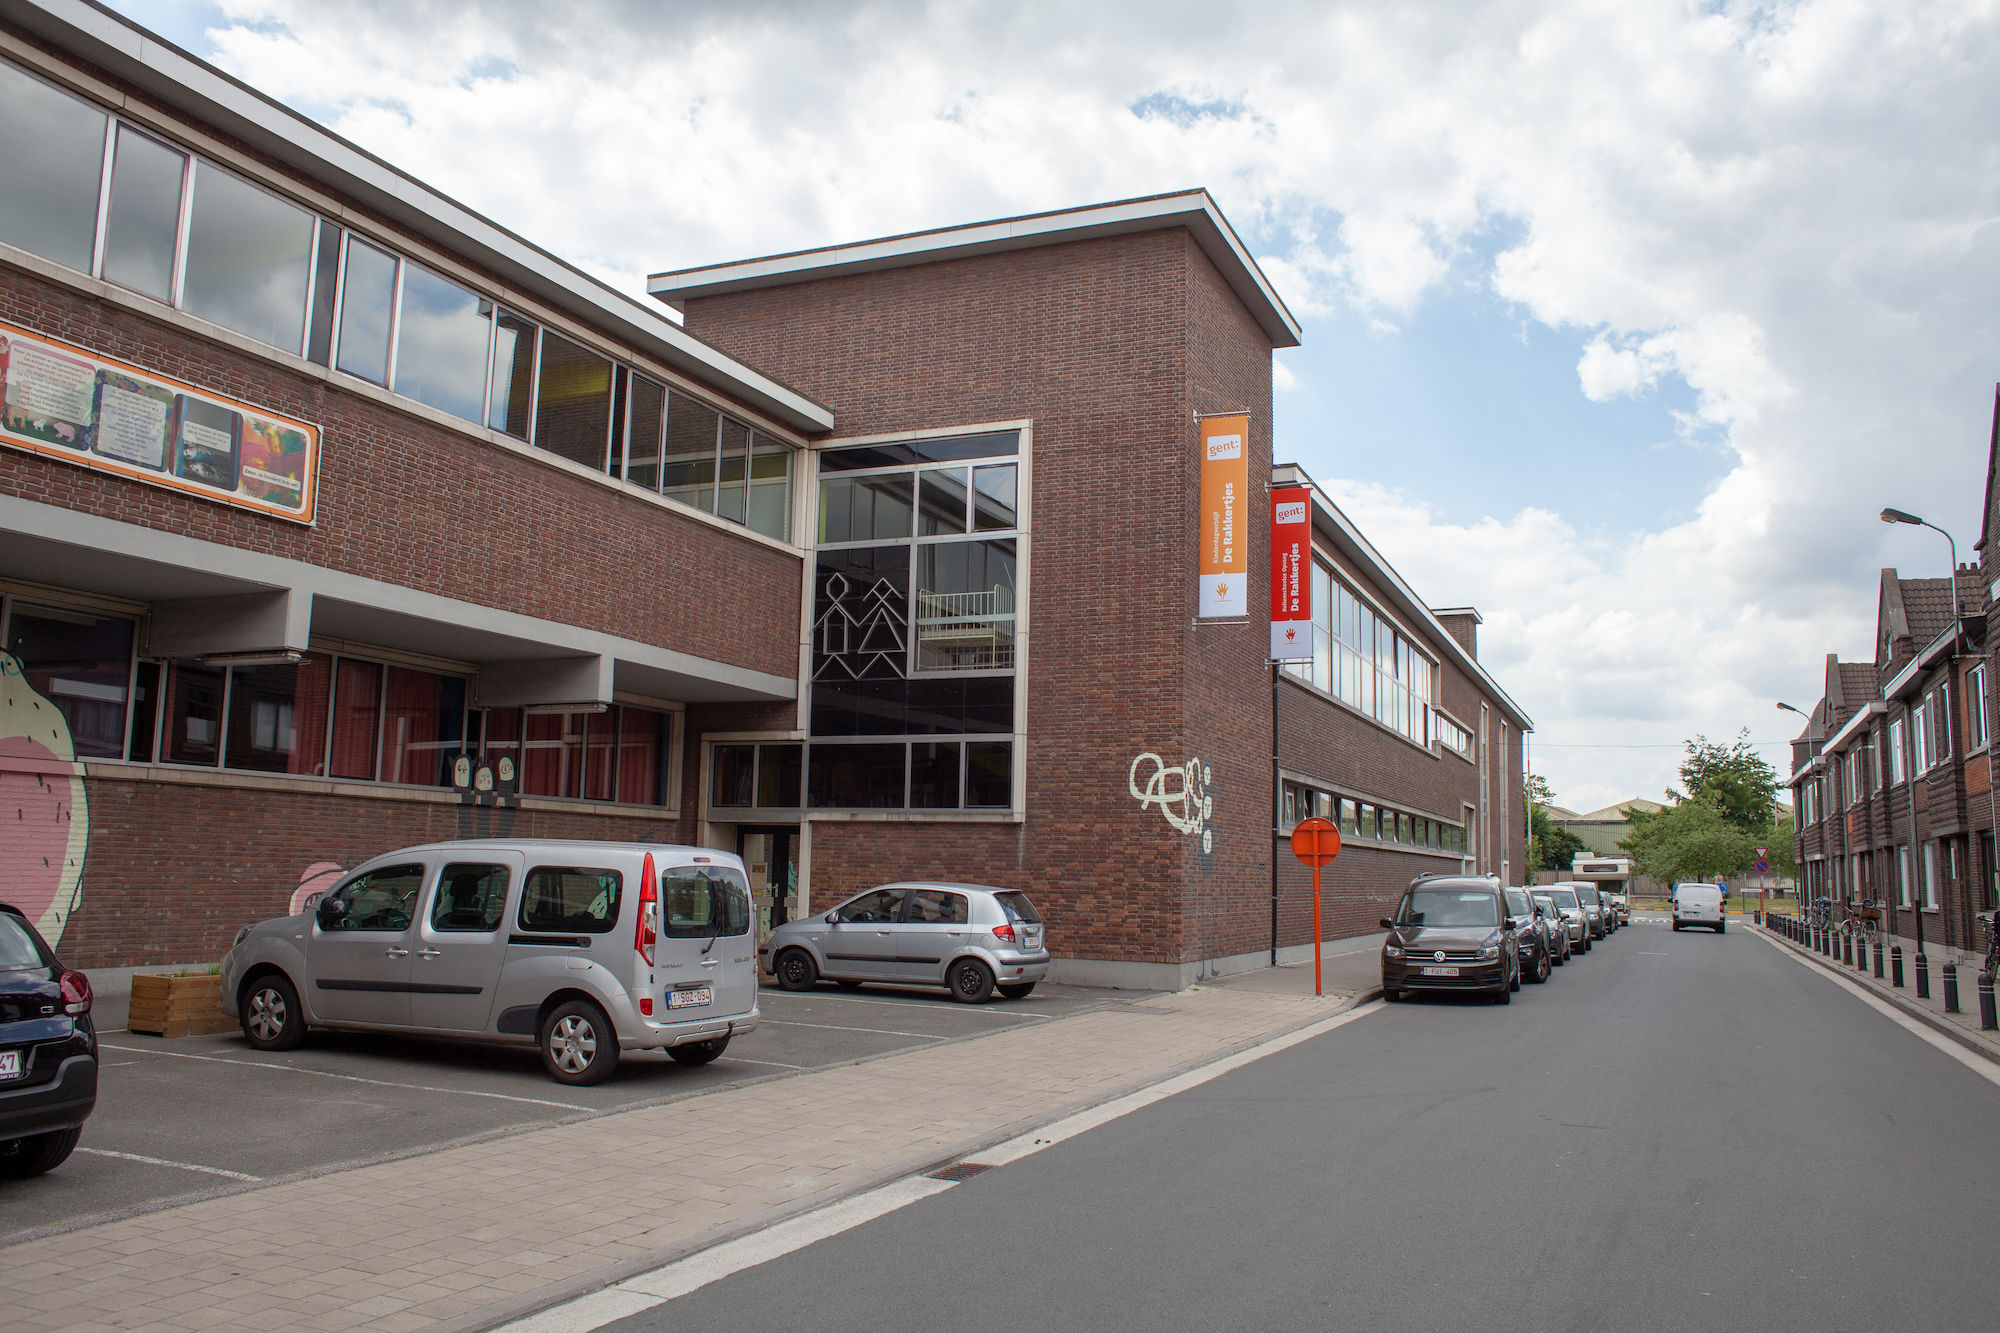 2019-07-02 Muide Meulestede prospectie Wannes_stadsvernieuwing_IMG_0328-3.jpg